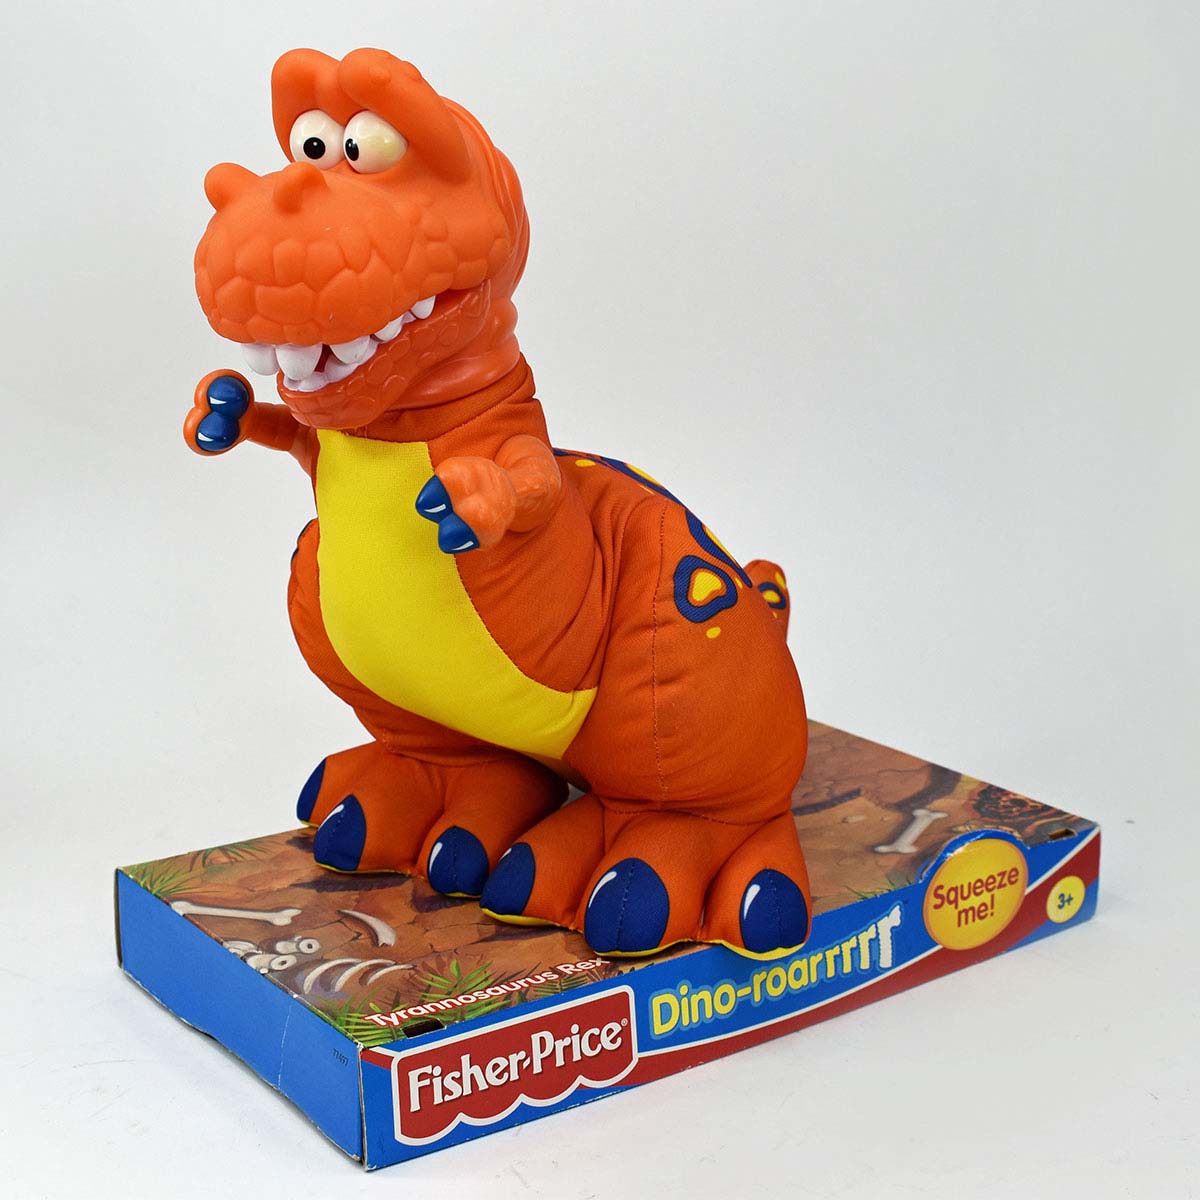 Fisher Price 'Dino-roarrrrr' Tyrannosaurus Rex Puffalump Stuffed Toy